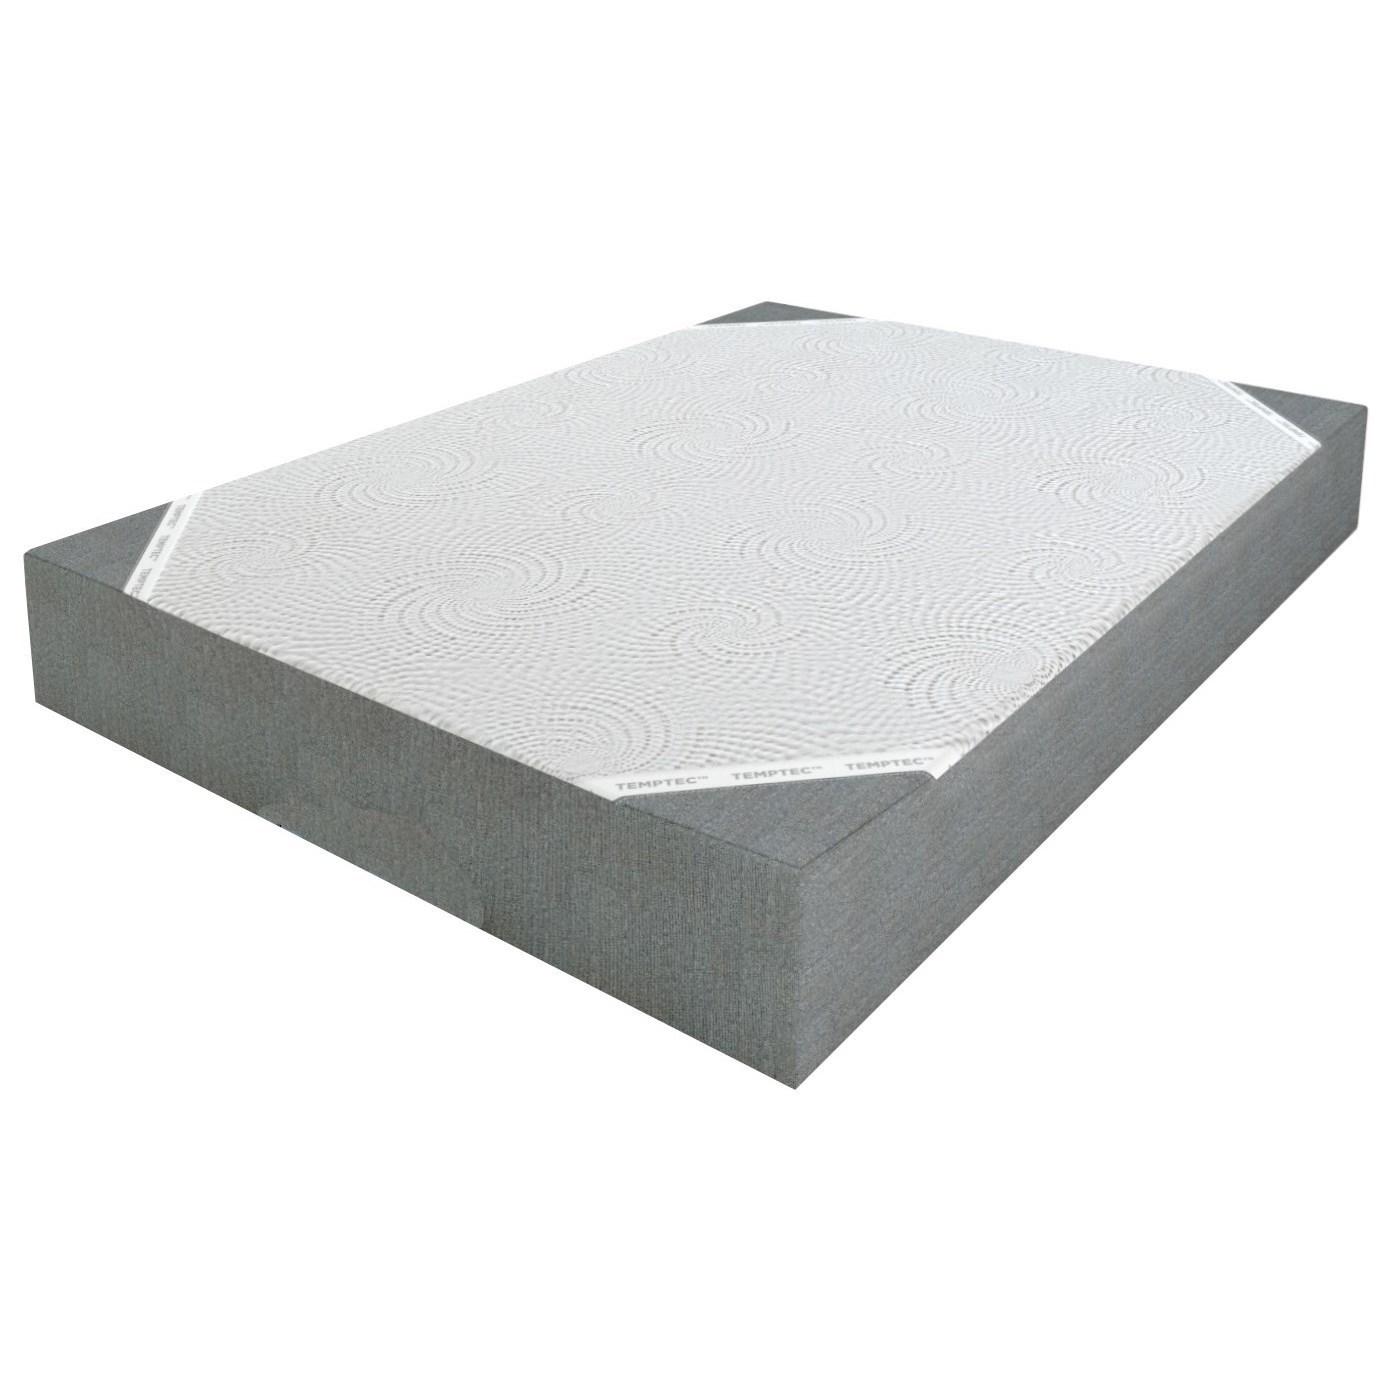 "Wedgewood II 8 Twin XL 8"" Gel Memory Foam Mattress by Restonic at Wilcox Furniture"